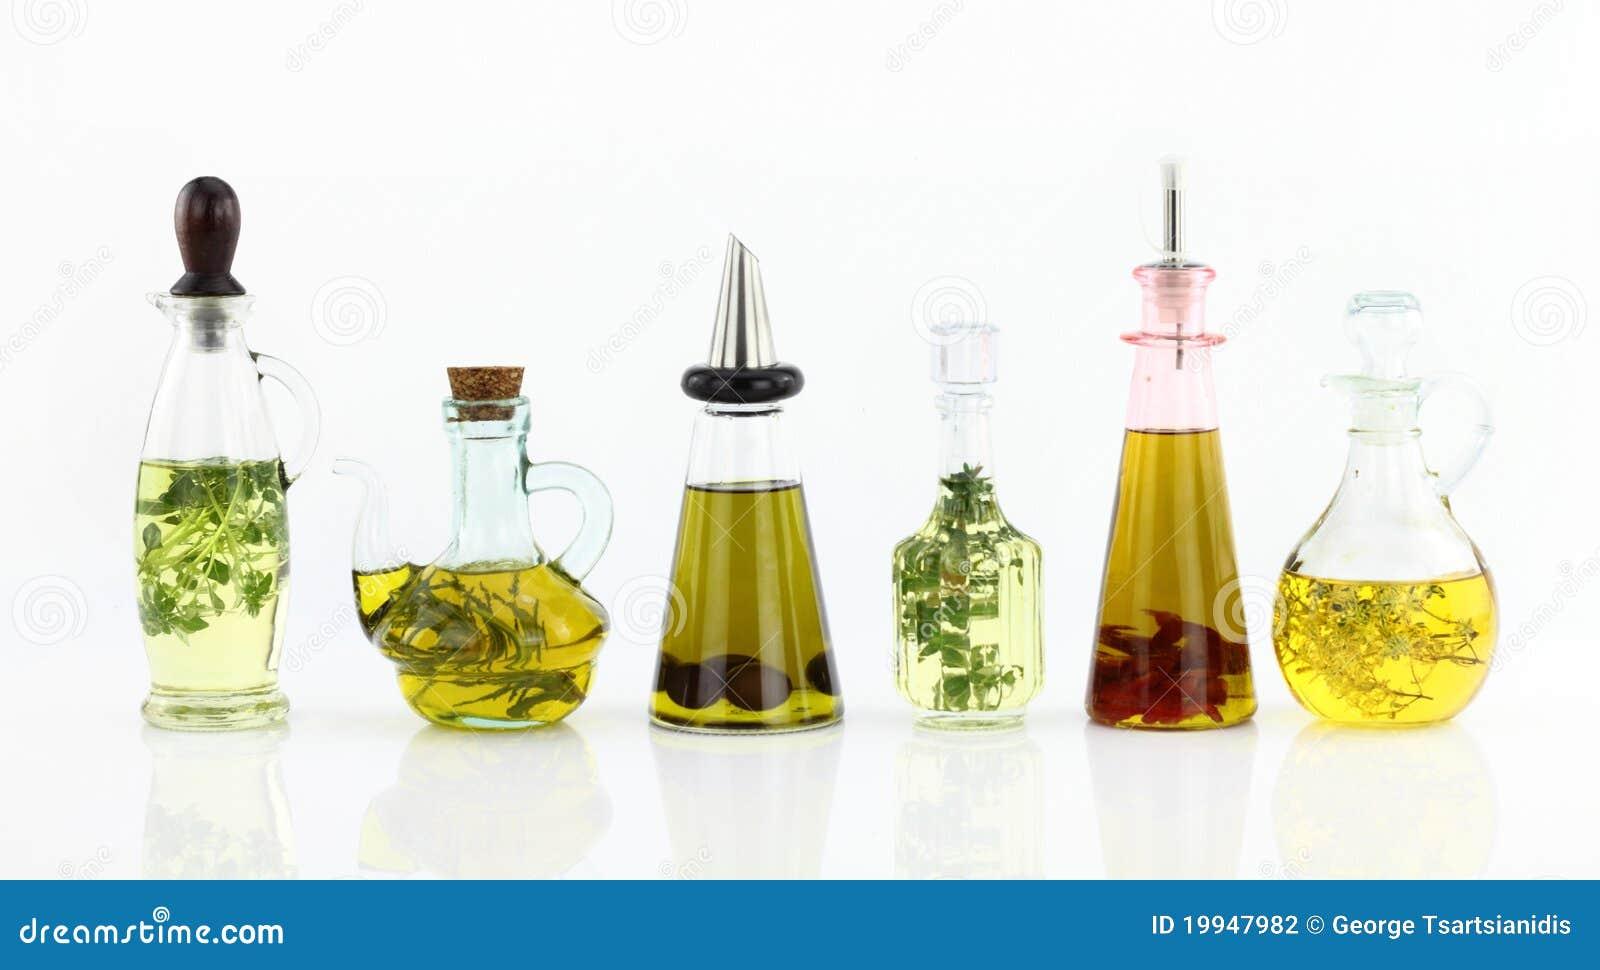 Kochendes Schmieröl